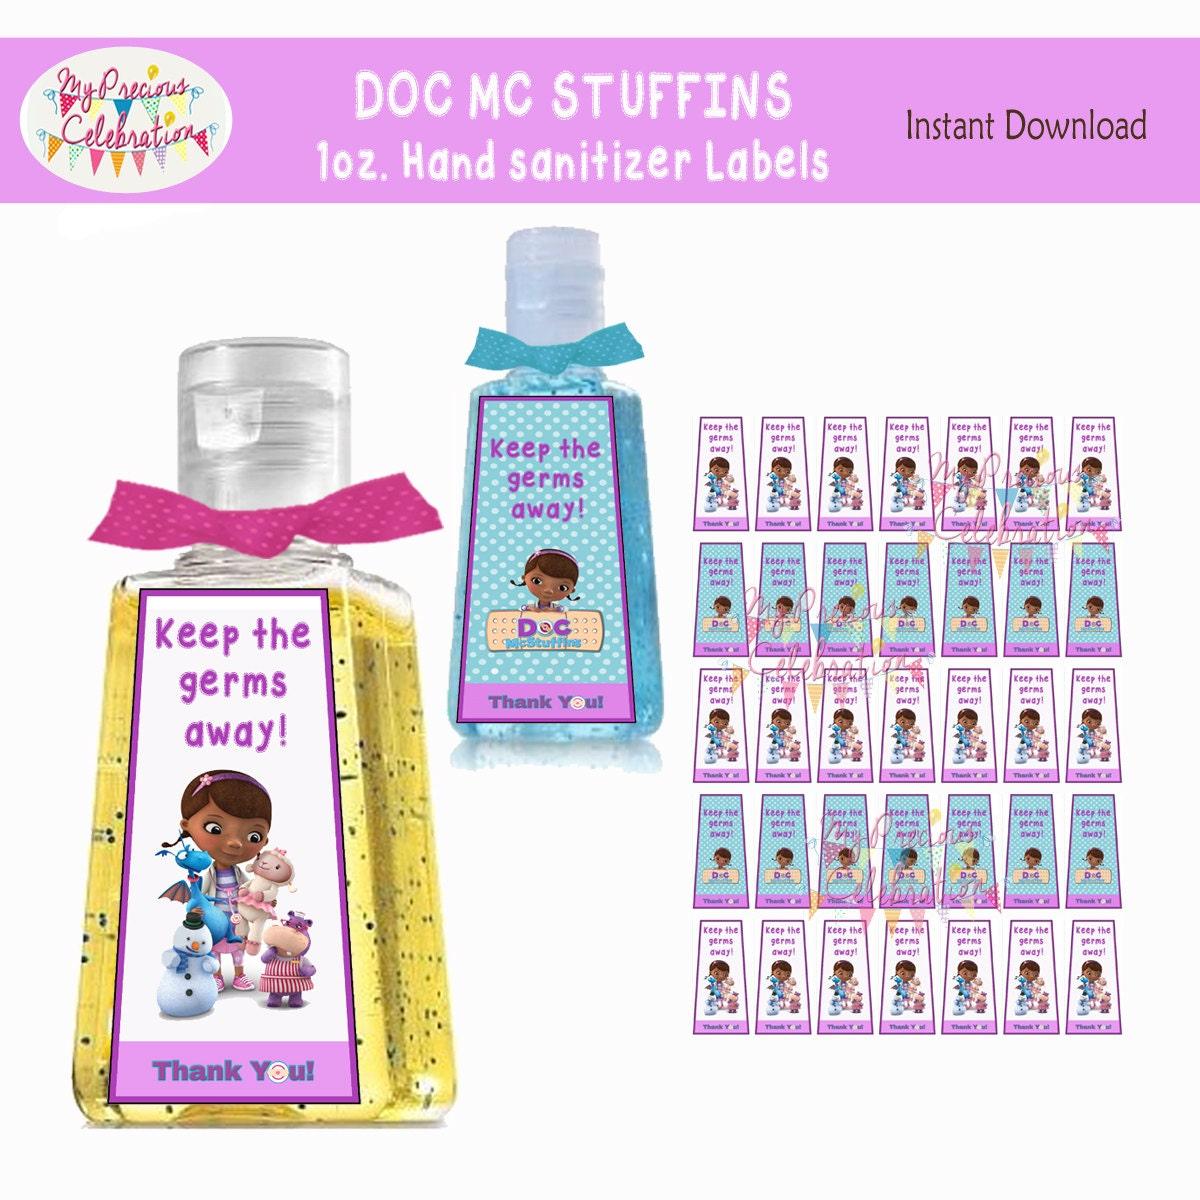 Digital Doc Mcstuffins Instant Download 1 Oz Hand